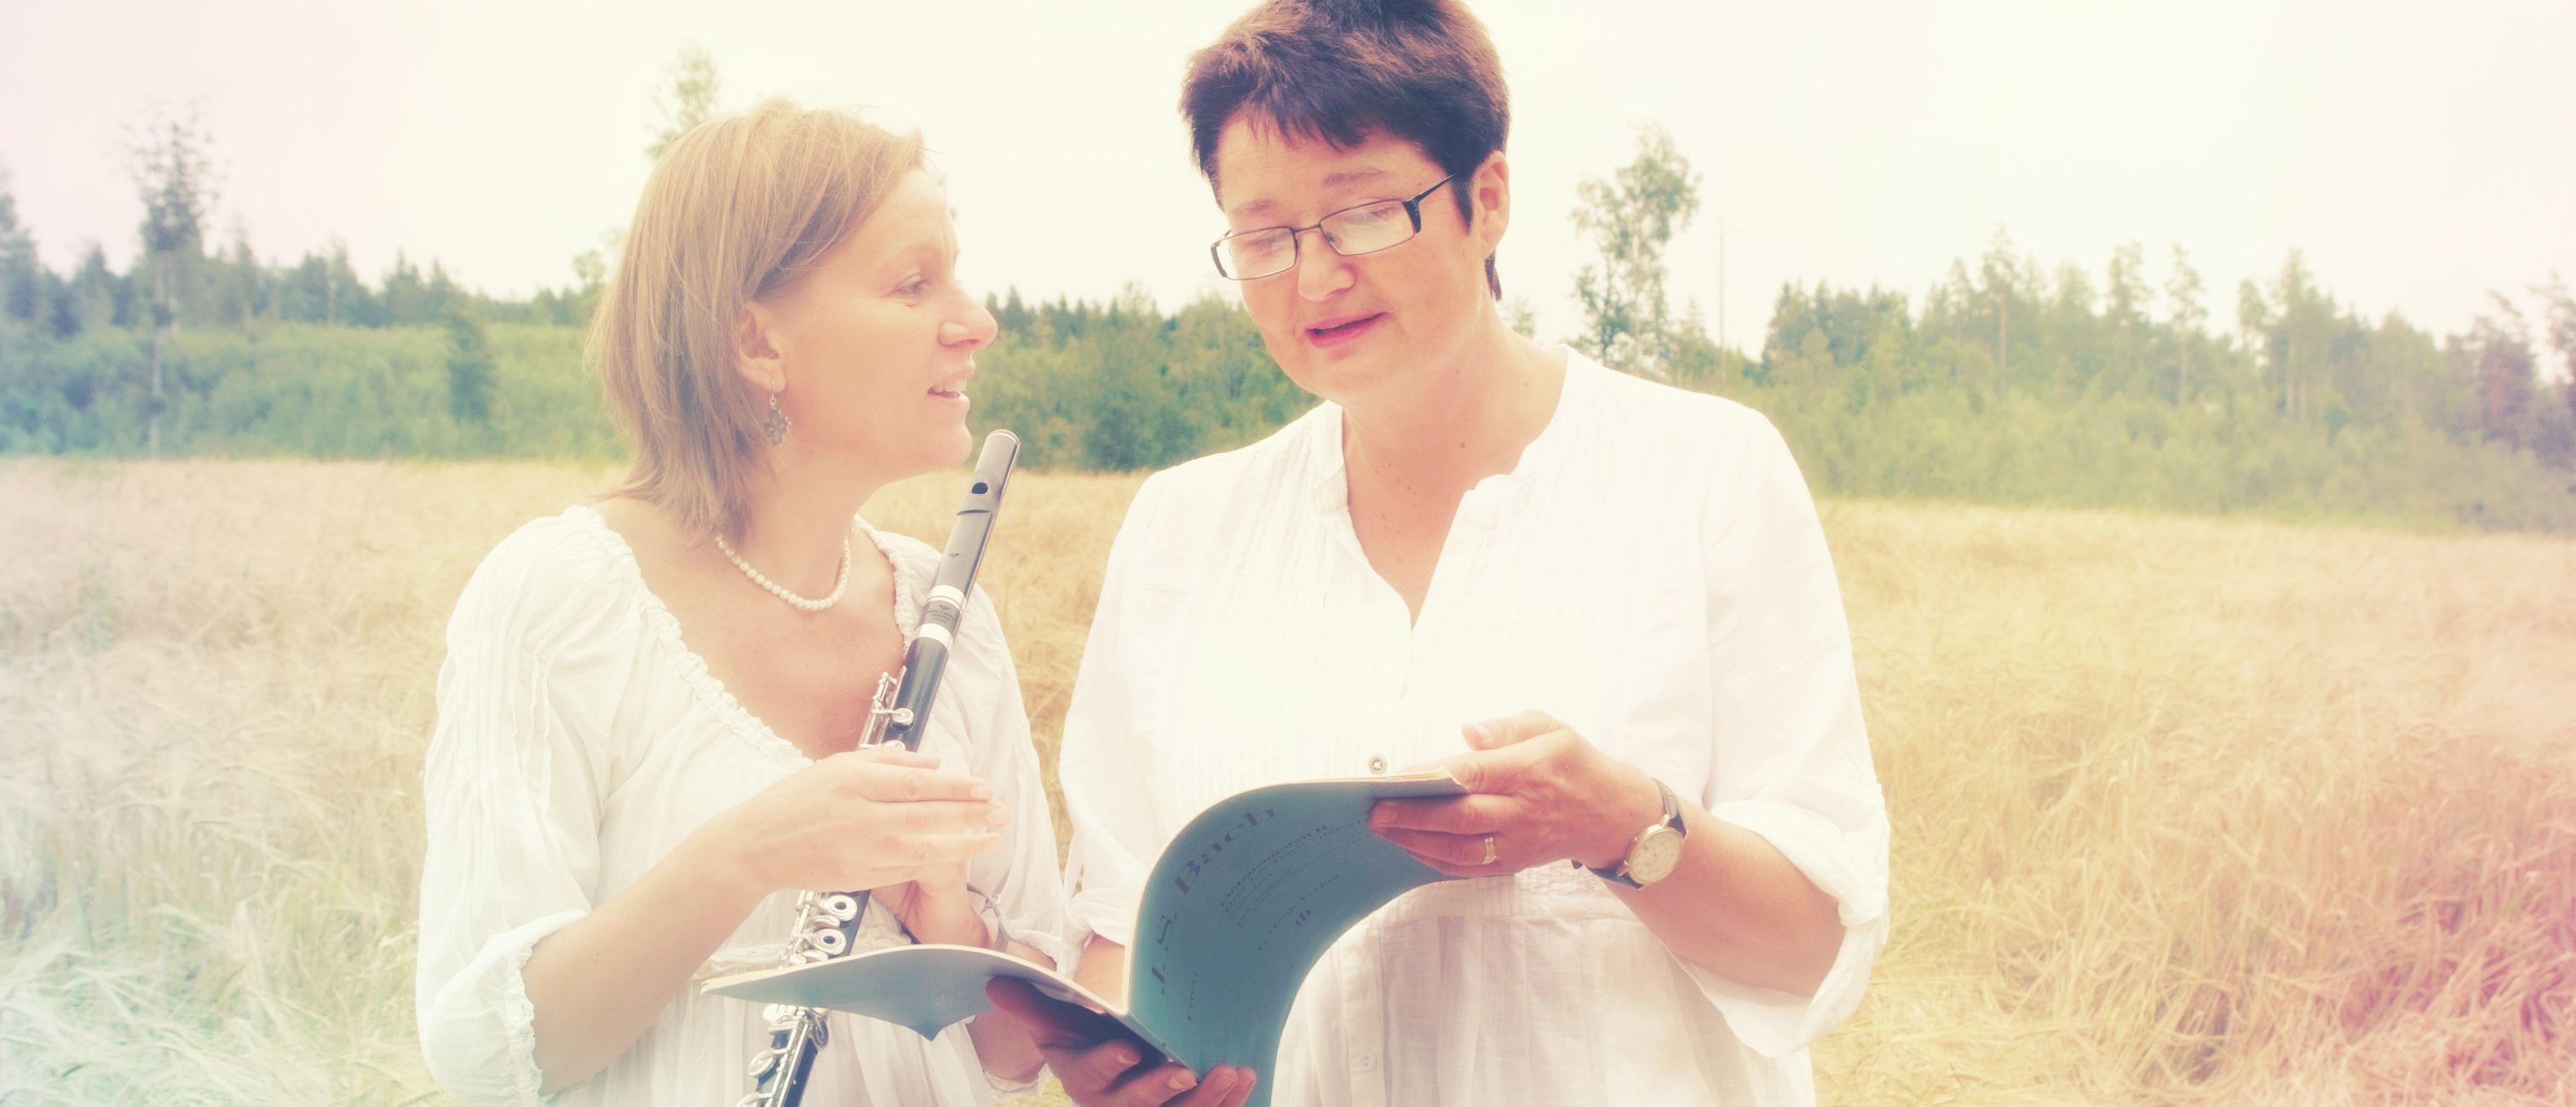 Bach-2010-043x